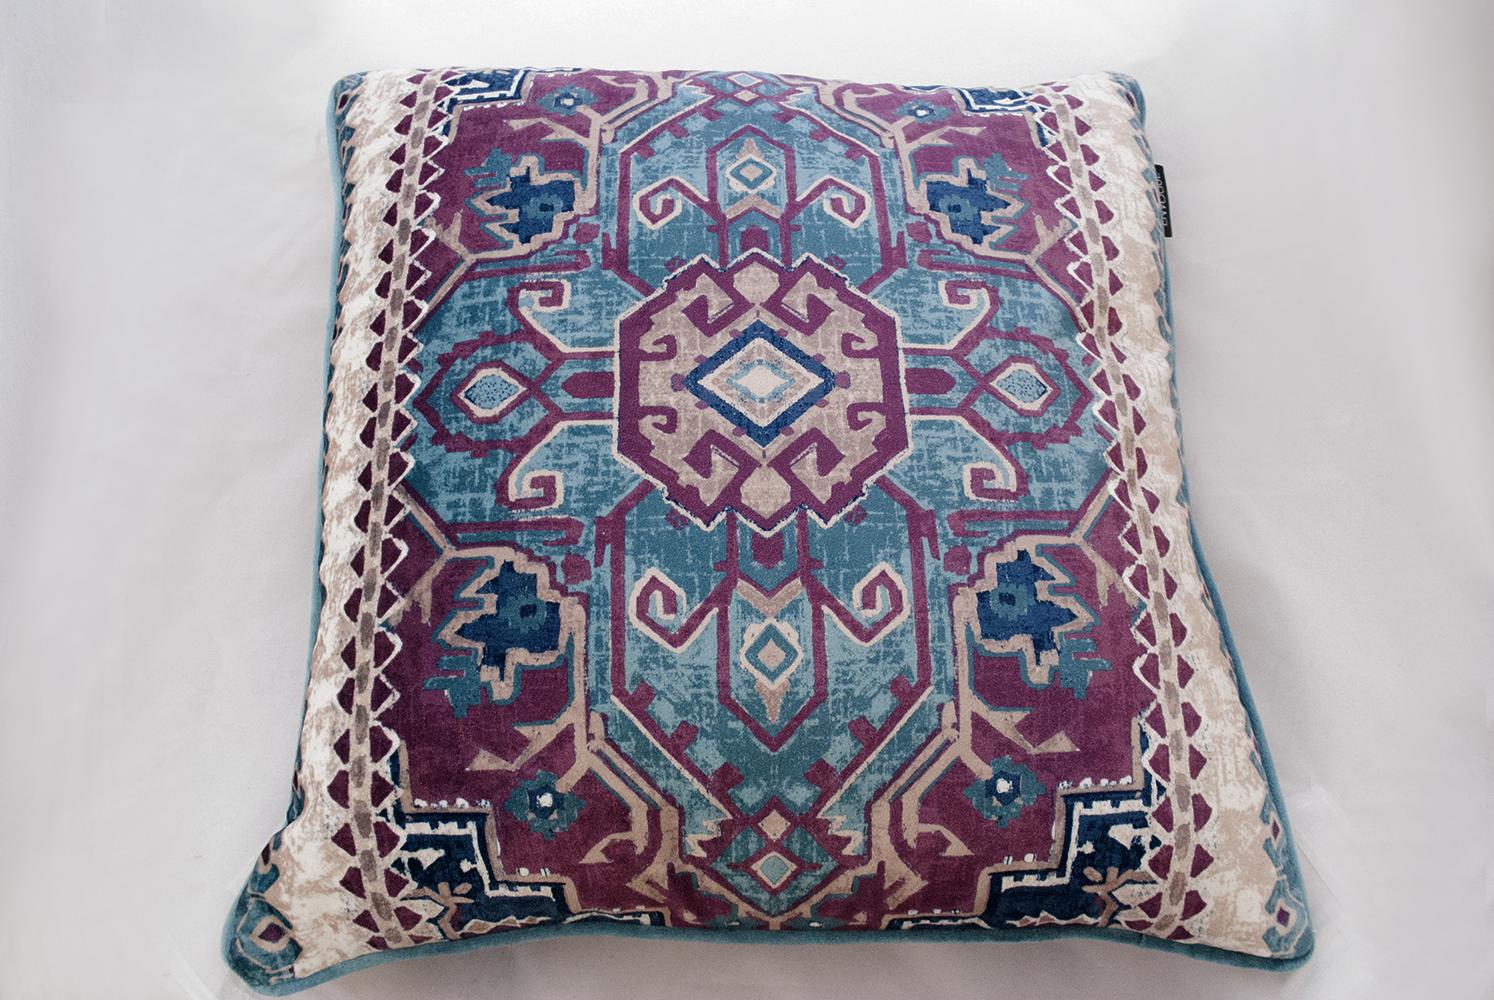 purple aztec pillow   Quantity: 2  Price: $10.00